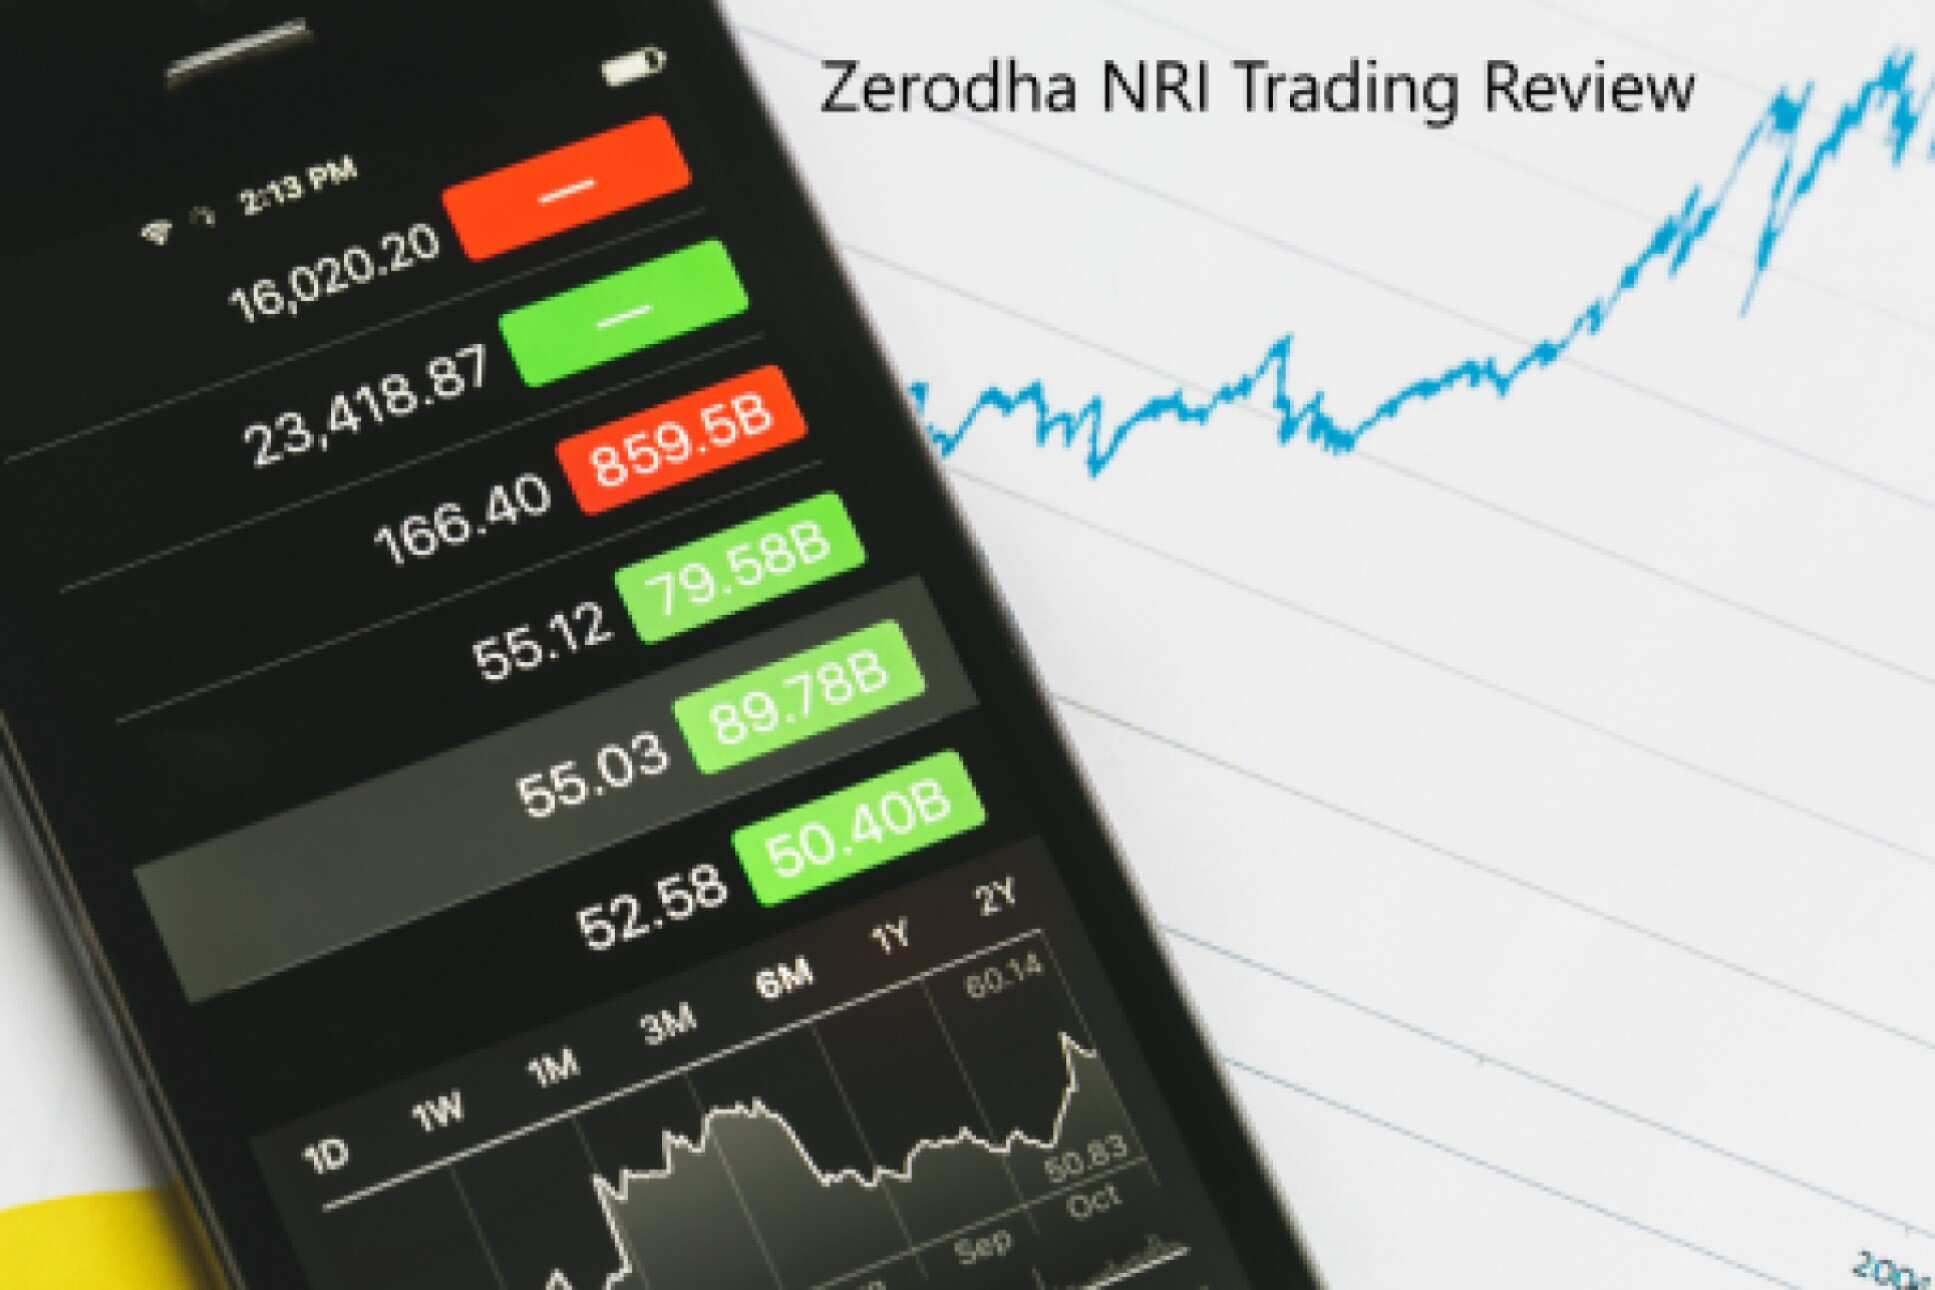 Zerodha NRI Trading Review